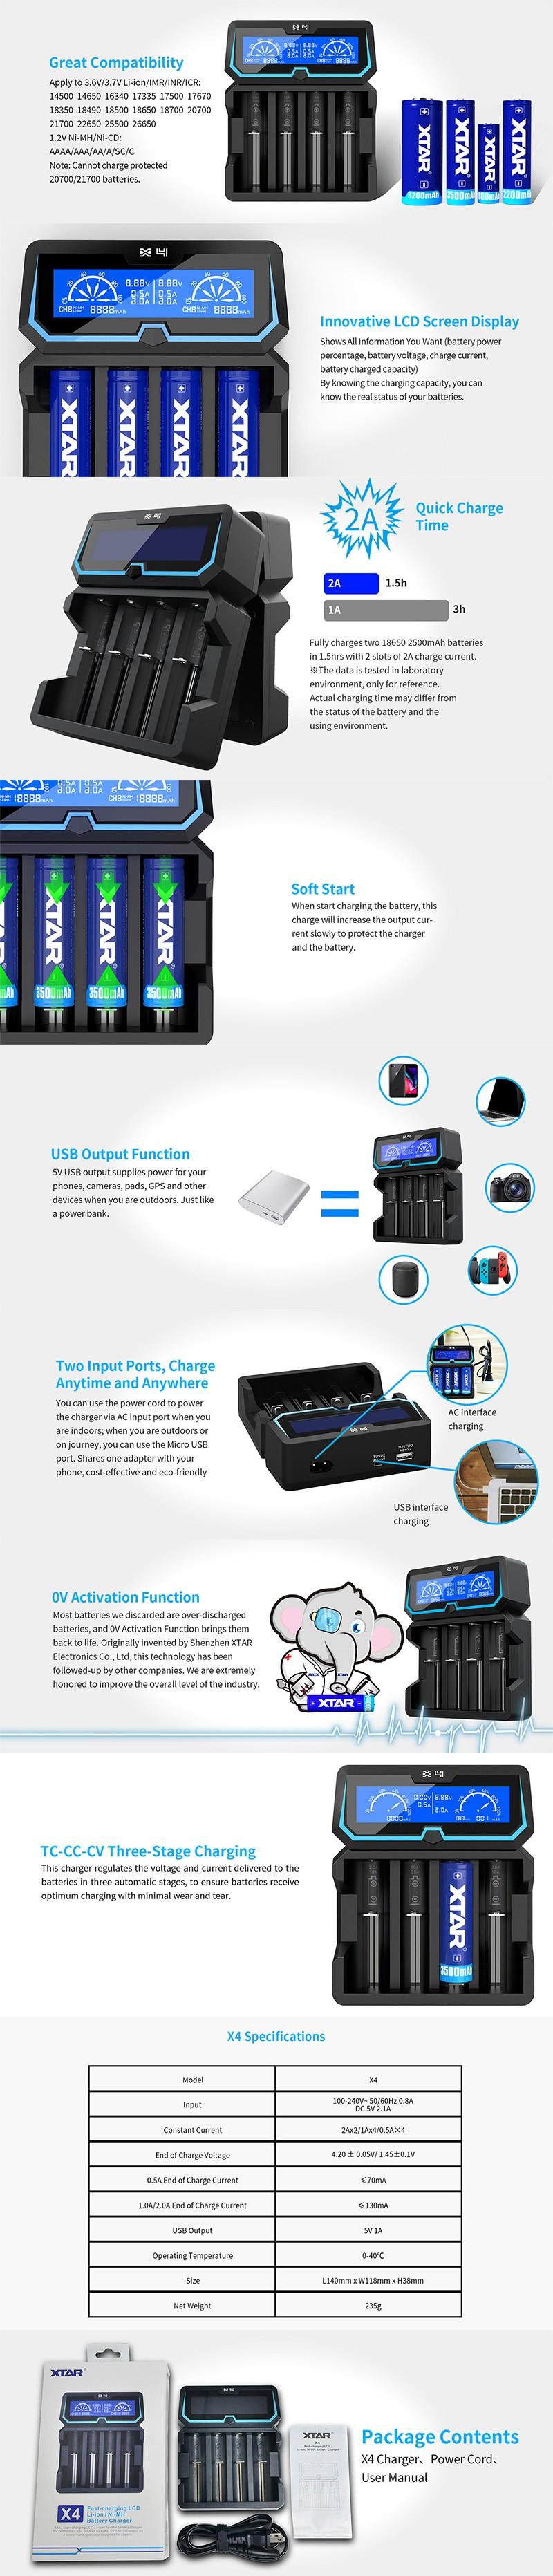 XTAR X4 Charger for 3.6V / 3.7V Li-ion / IMR / INR / 18350 / 18500 / 18650/18700/20700/21700 Batteries, etc.